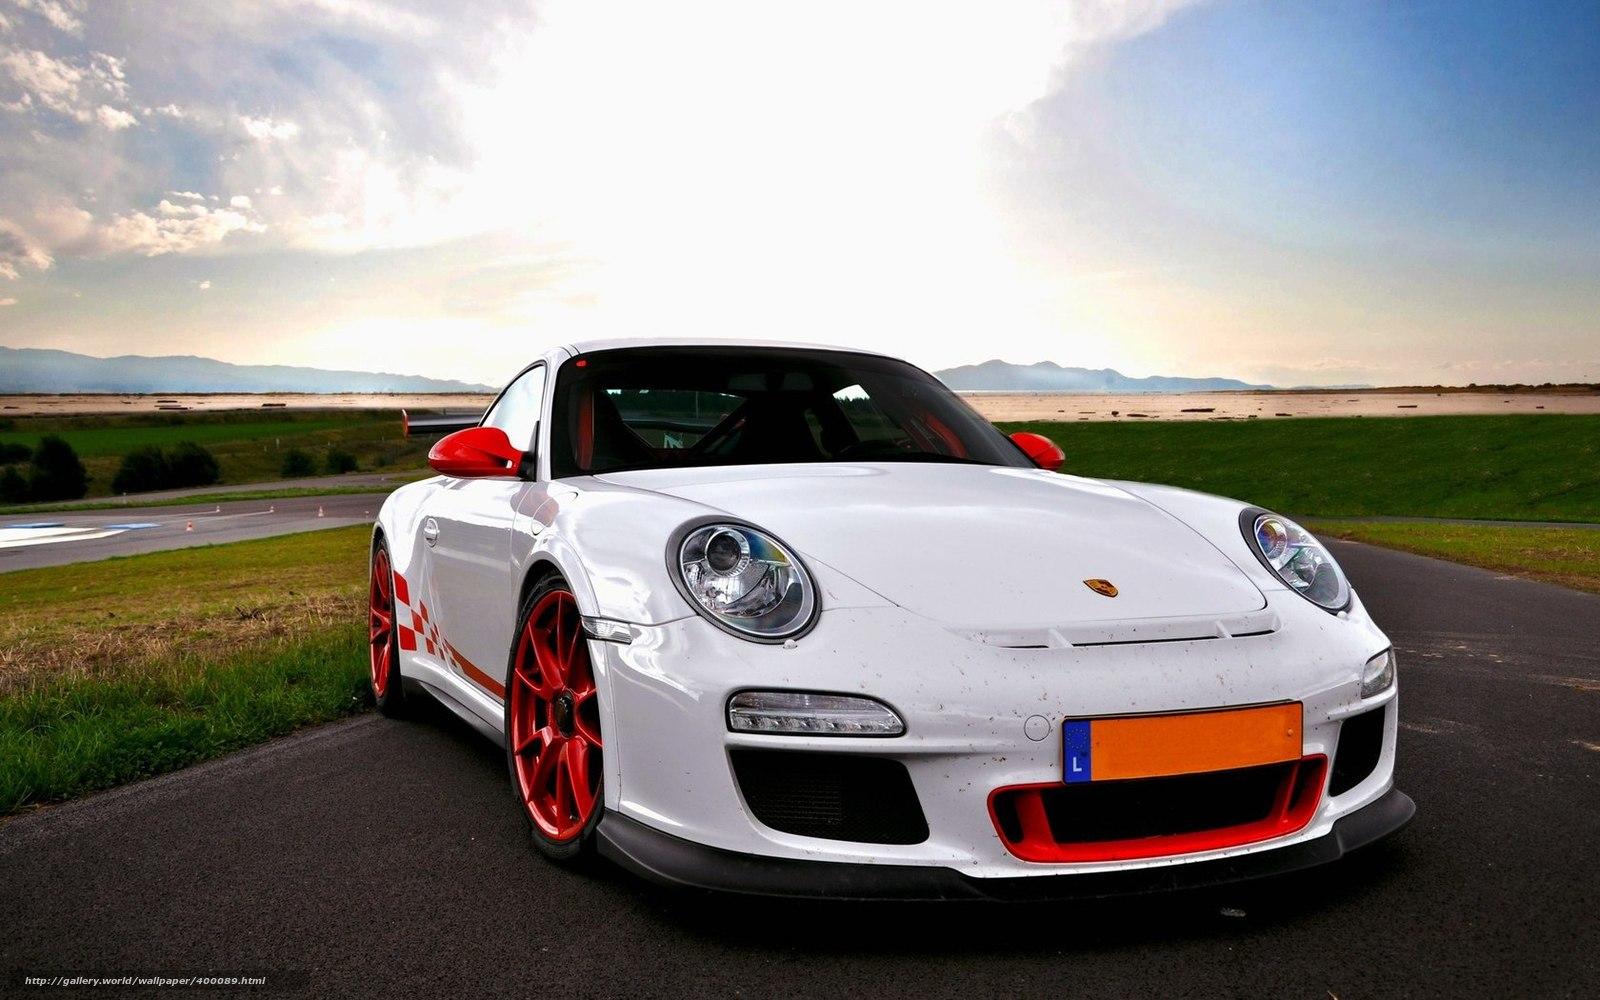 Download Wallpaper Car Porsche White Supercars Free